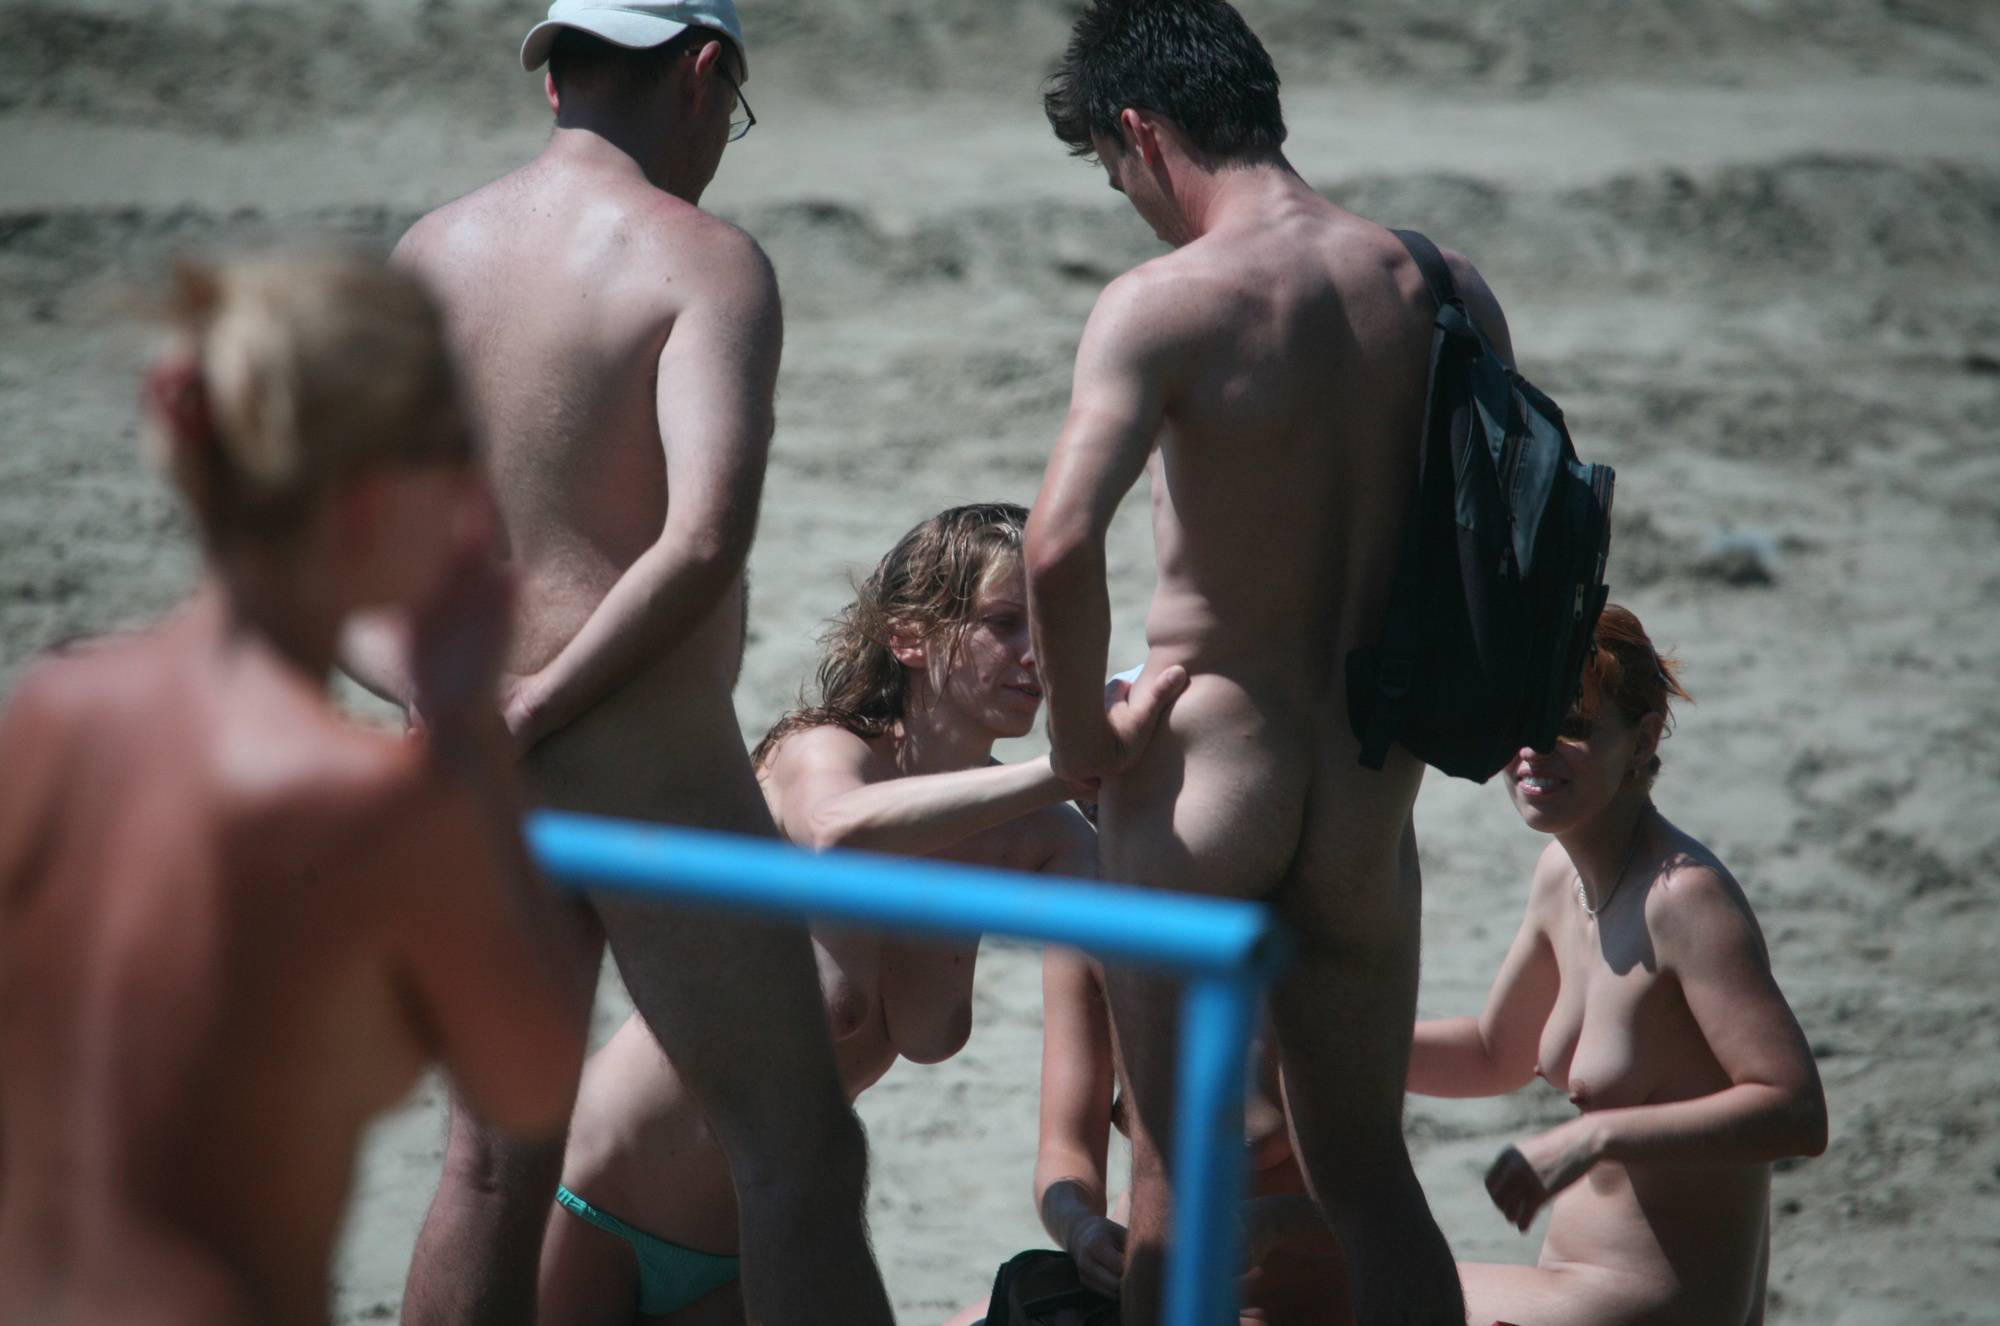 Nudist Pics Pier Sand Square Entrance - 1